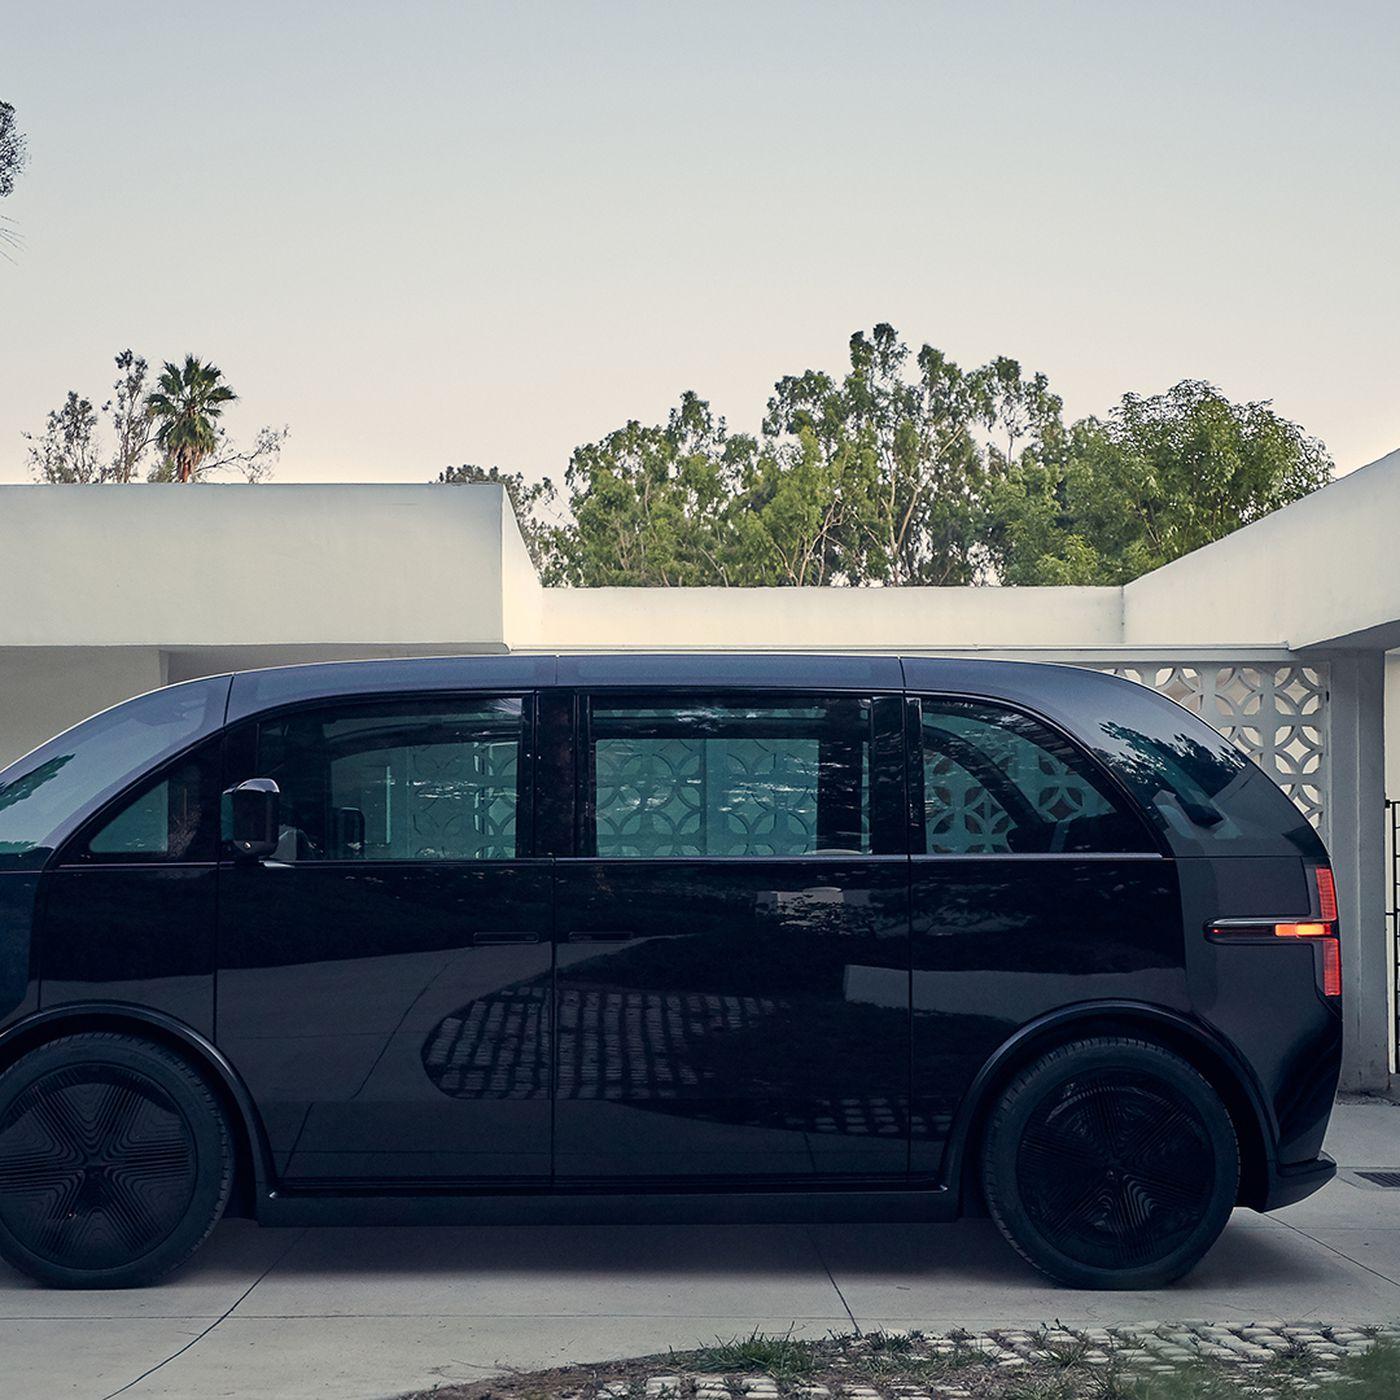 Koenigsegg Jesko Specs: FormaCar: Ex-BMW Team Unveils The Self-driving Canoo Van